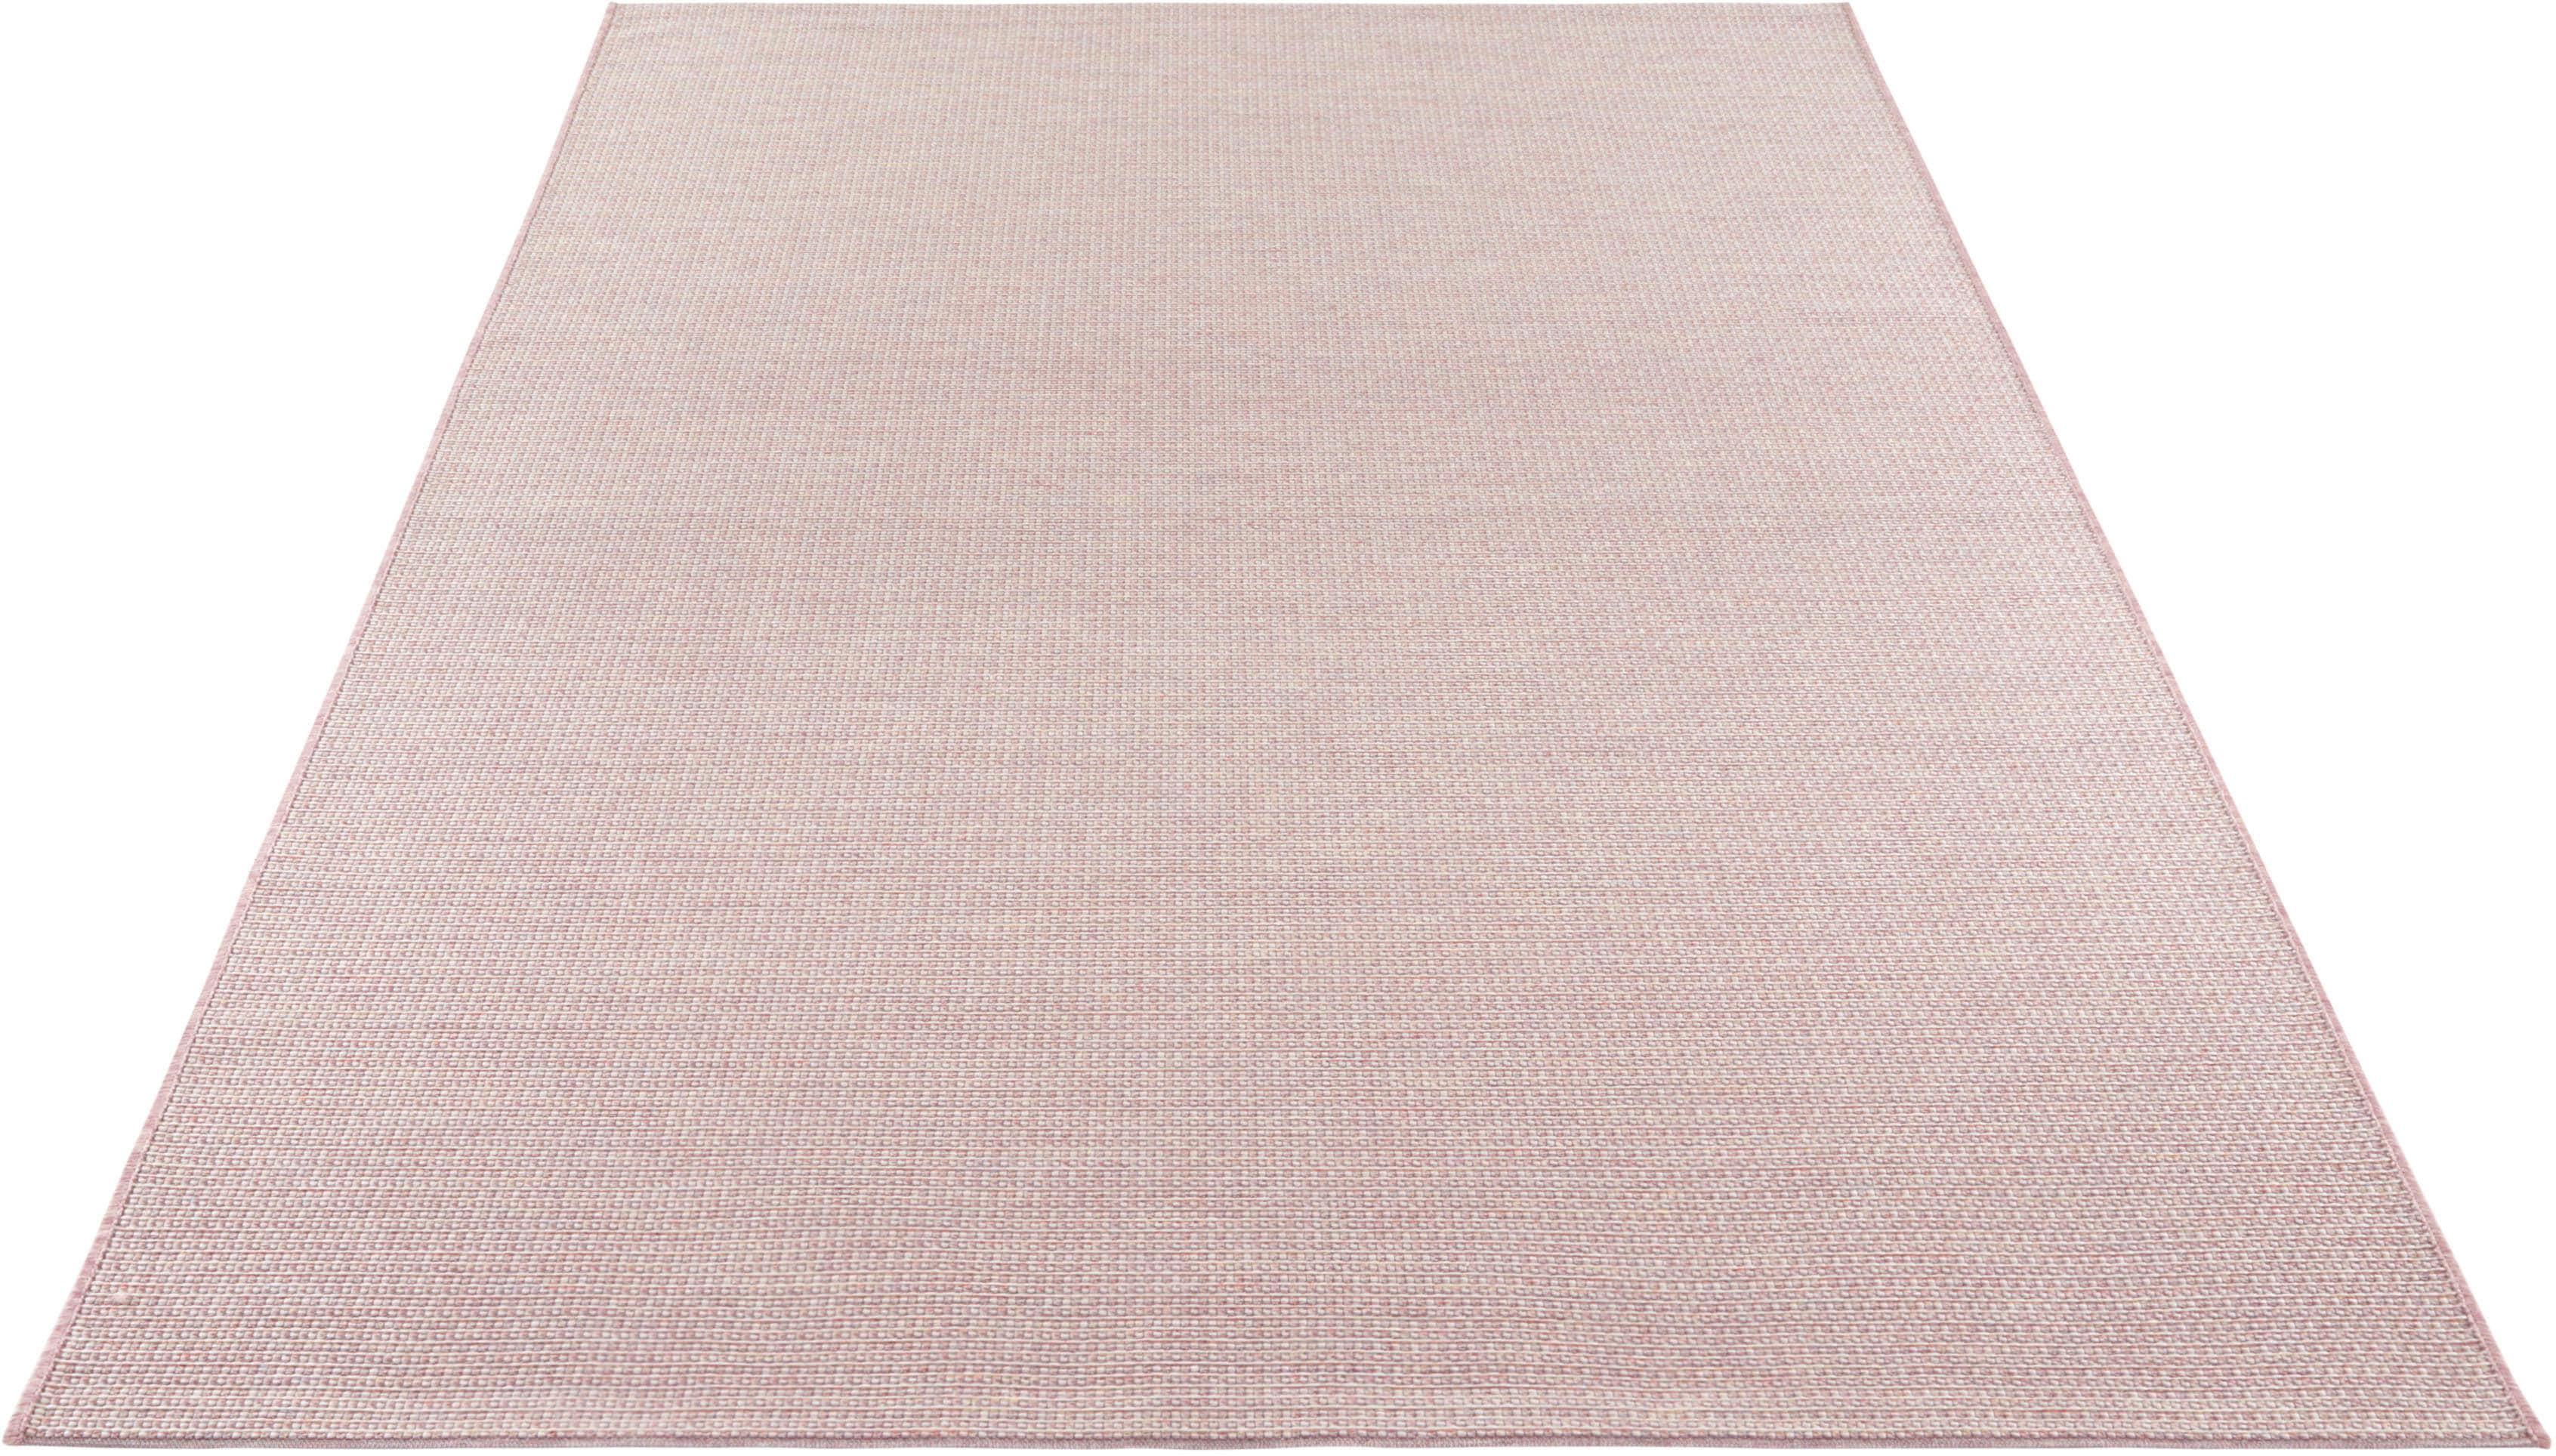 Teppich Millau ELLE Decor rechteckig Höhe 4 mm maschinell gewebt